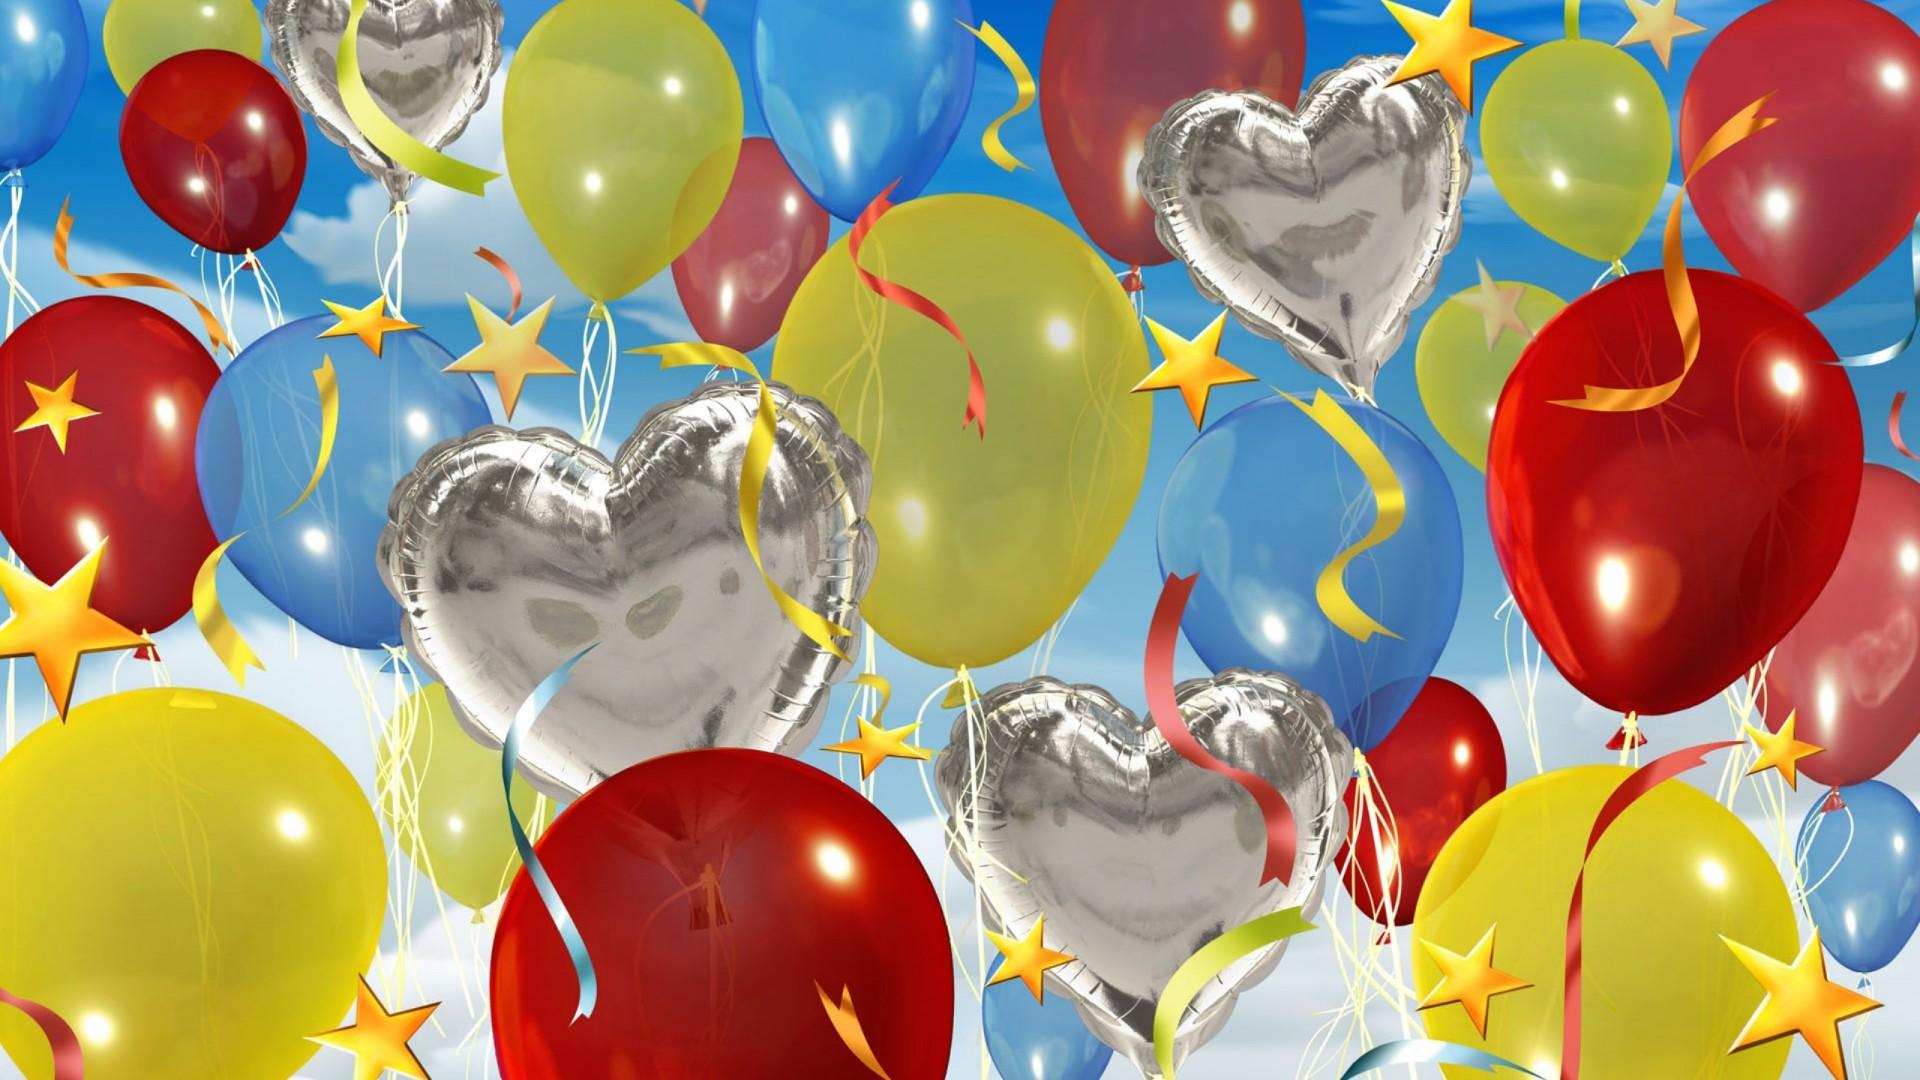 Happy Birthday Balloons Wallpaper 1056 1920x1080   uMadcom 1920x1080